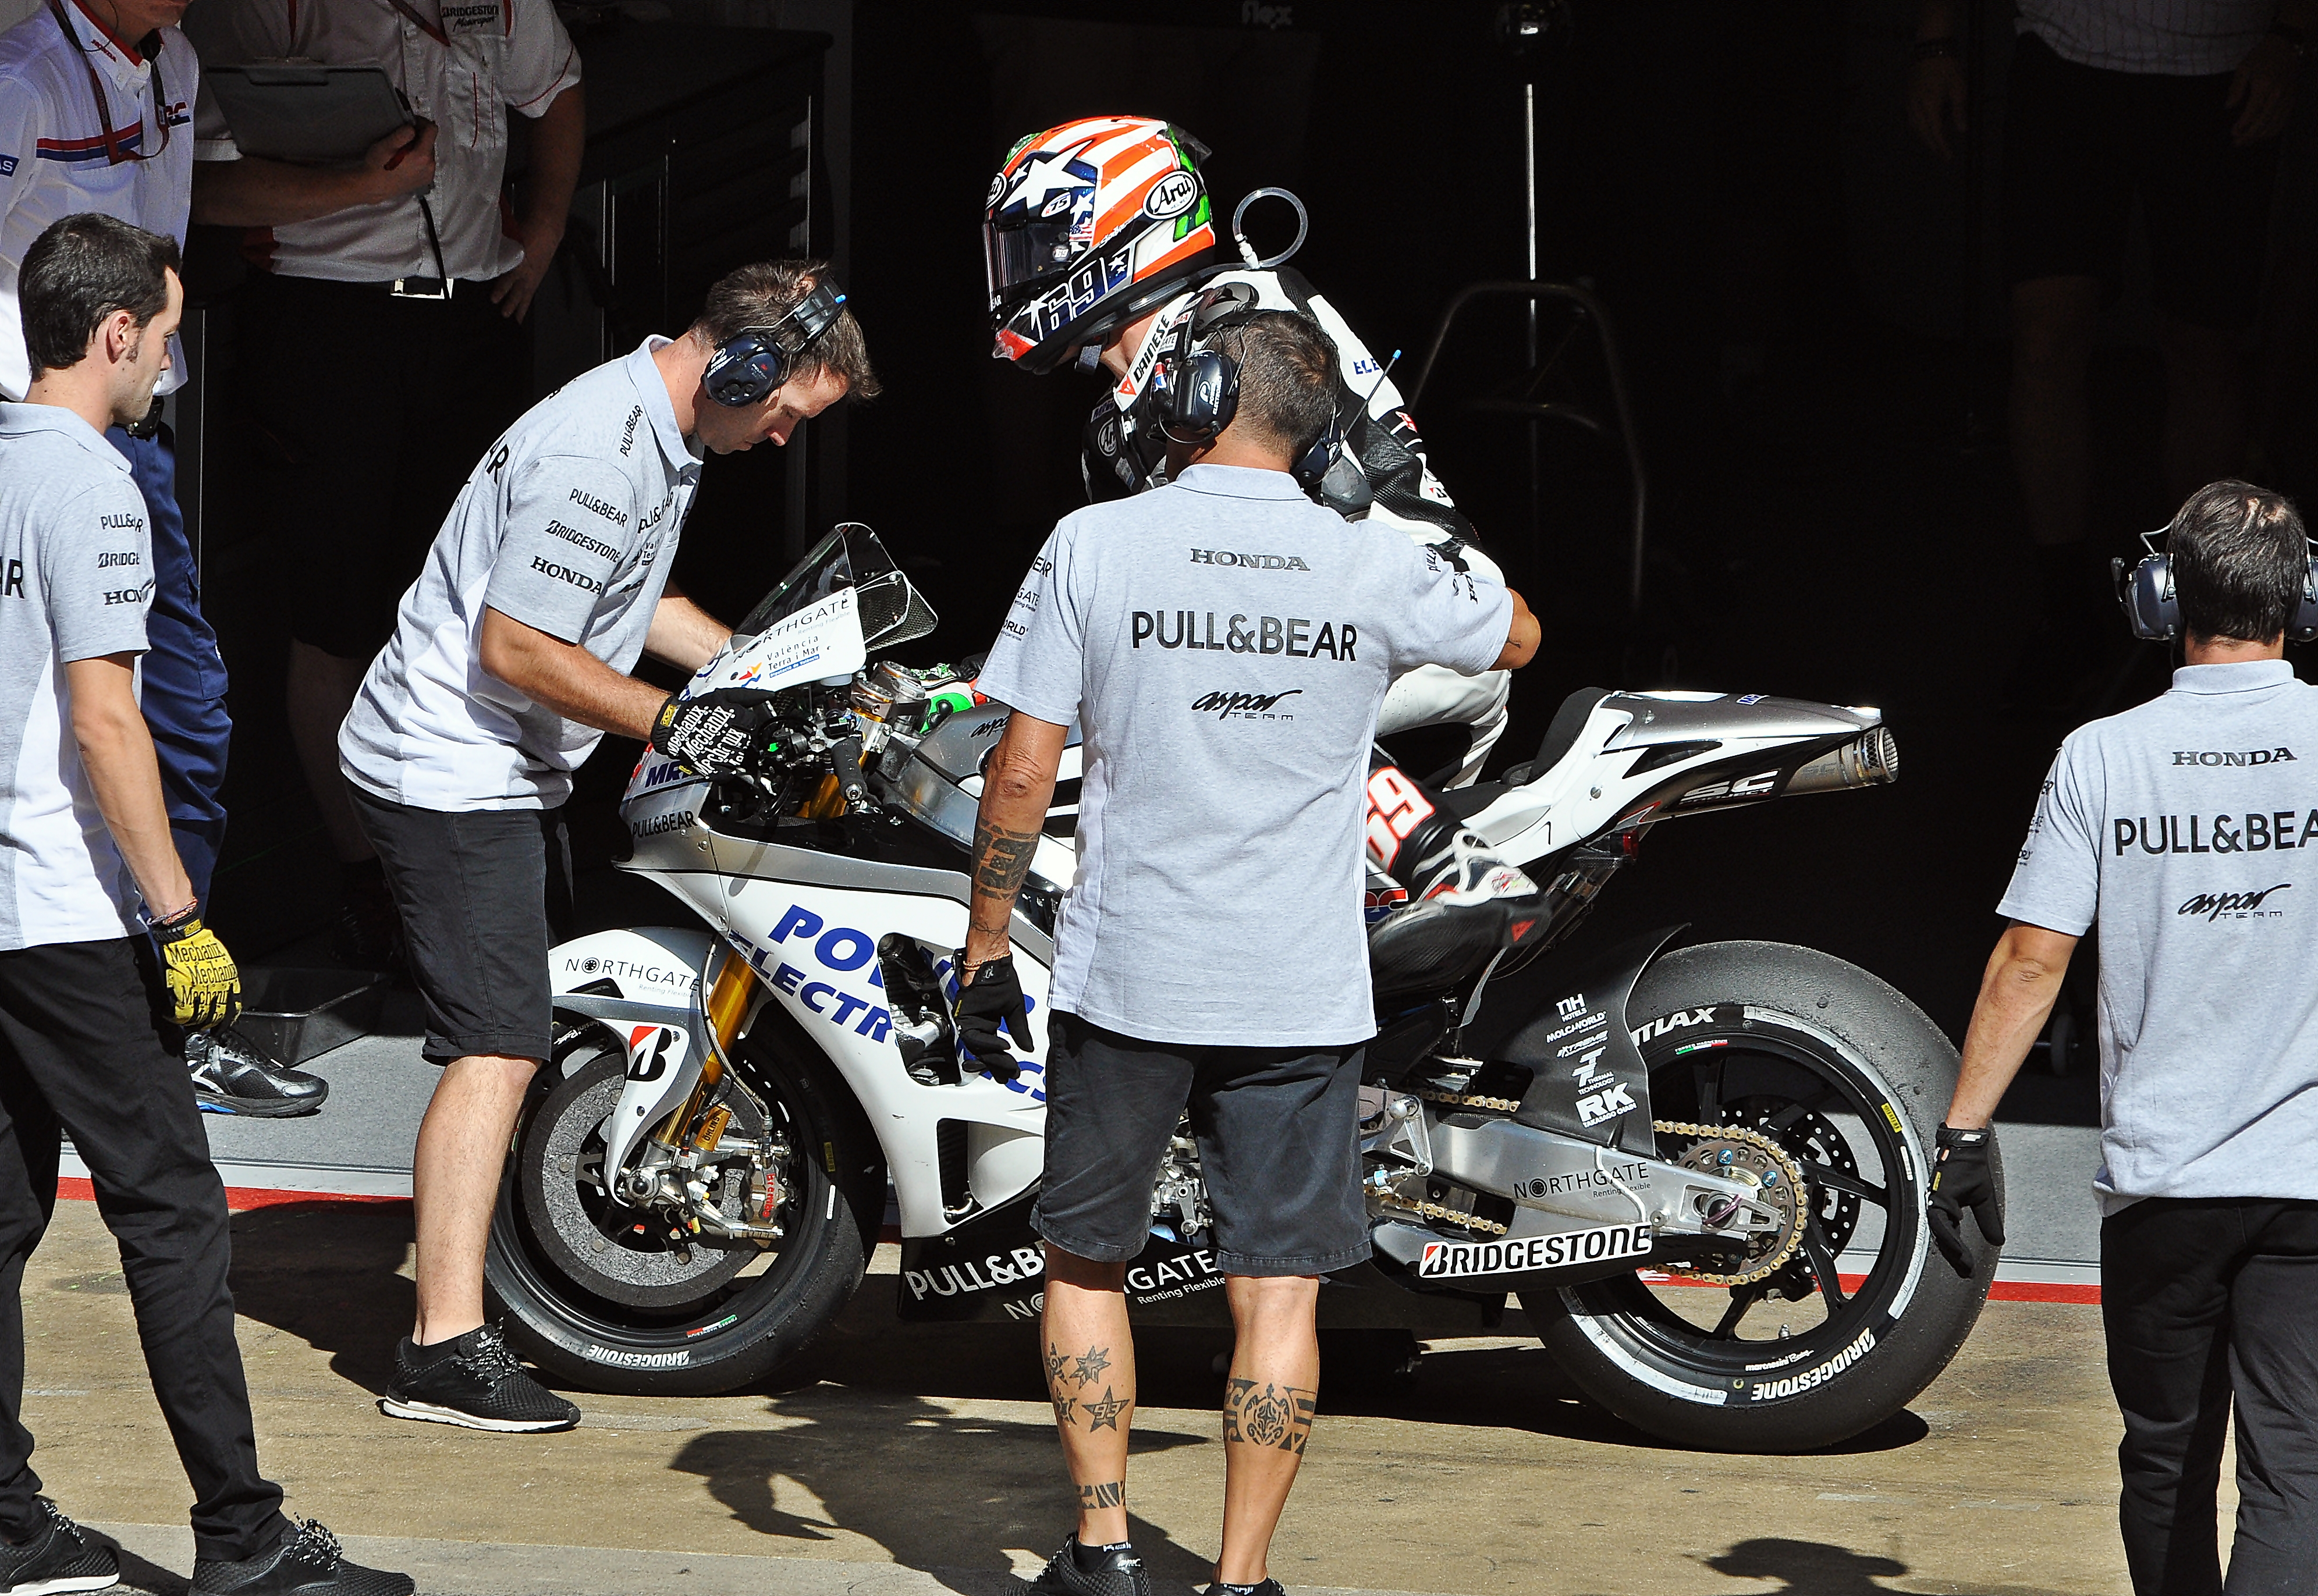 File Nicky Hayden Motogp 2015 Jpg Wikimedia Commons